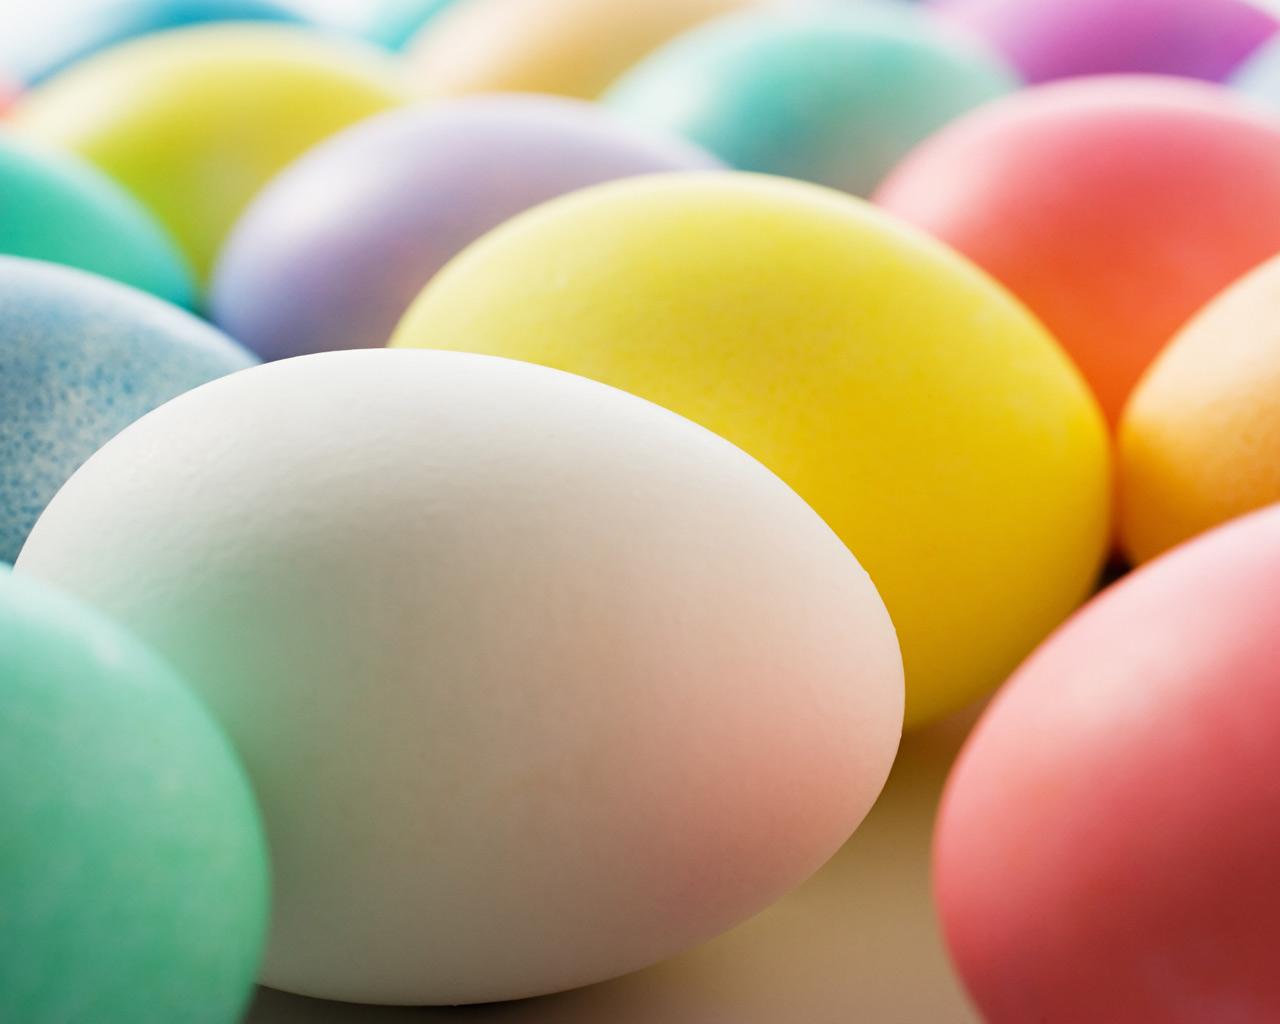 Easter eggs Desktop Wallpapers FREE on Latorocom 1280x1024